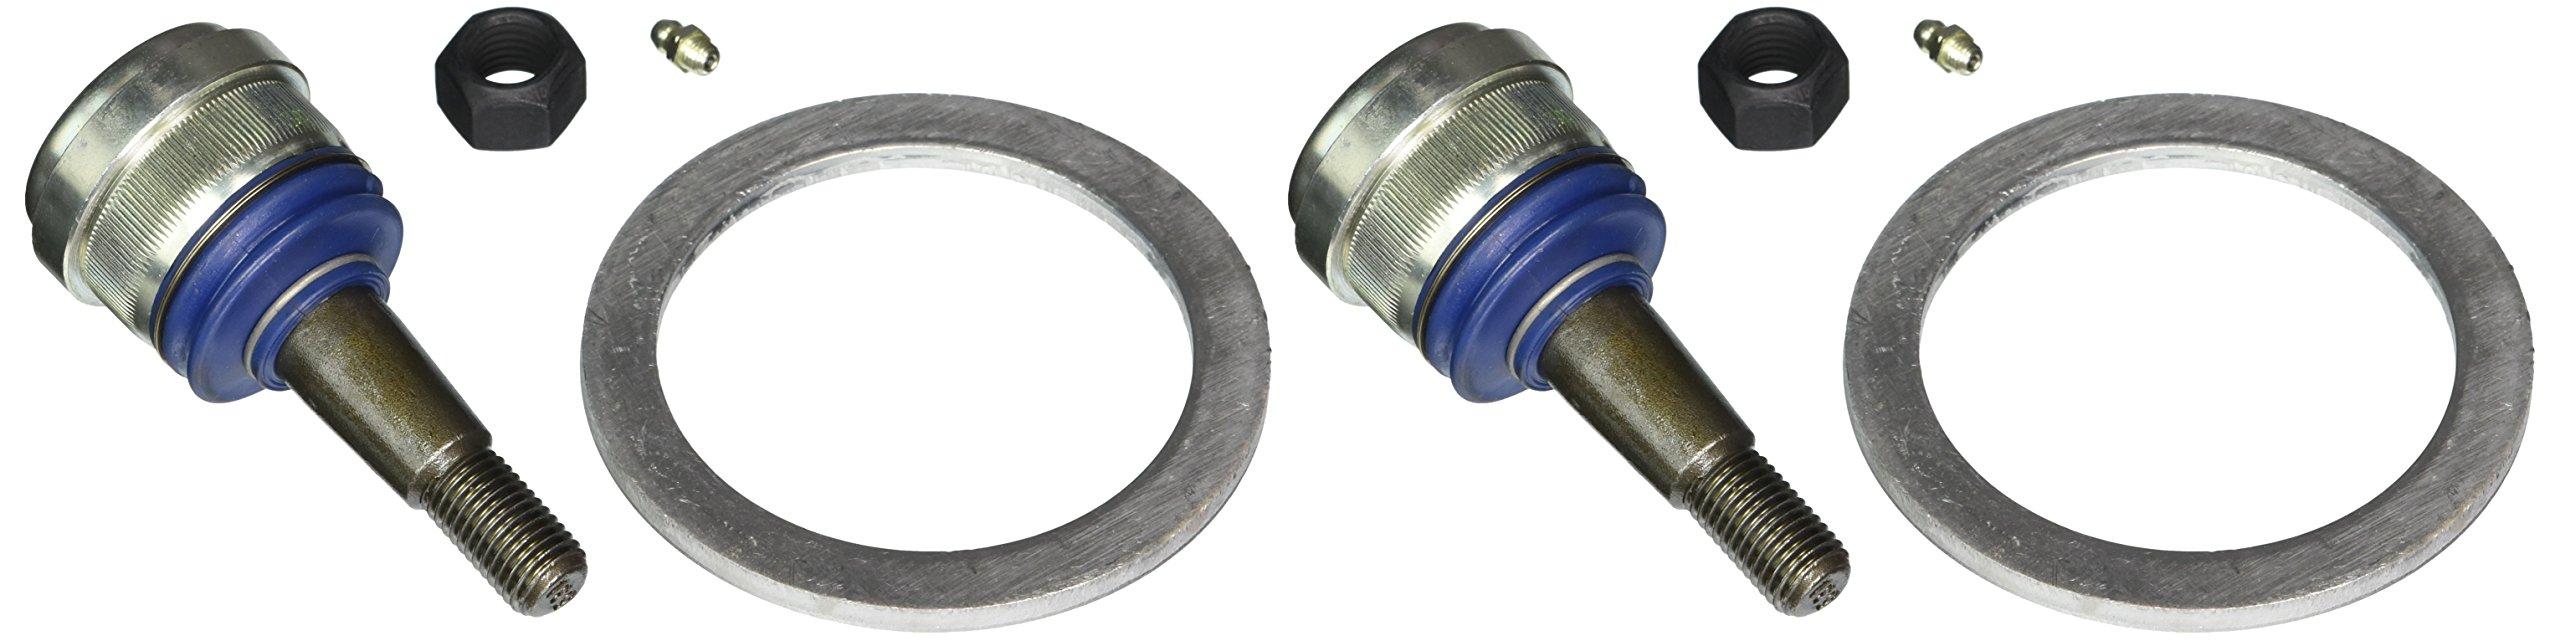 Steeda 555-8101 X2 Ball Joint